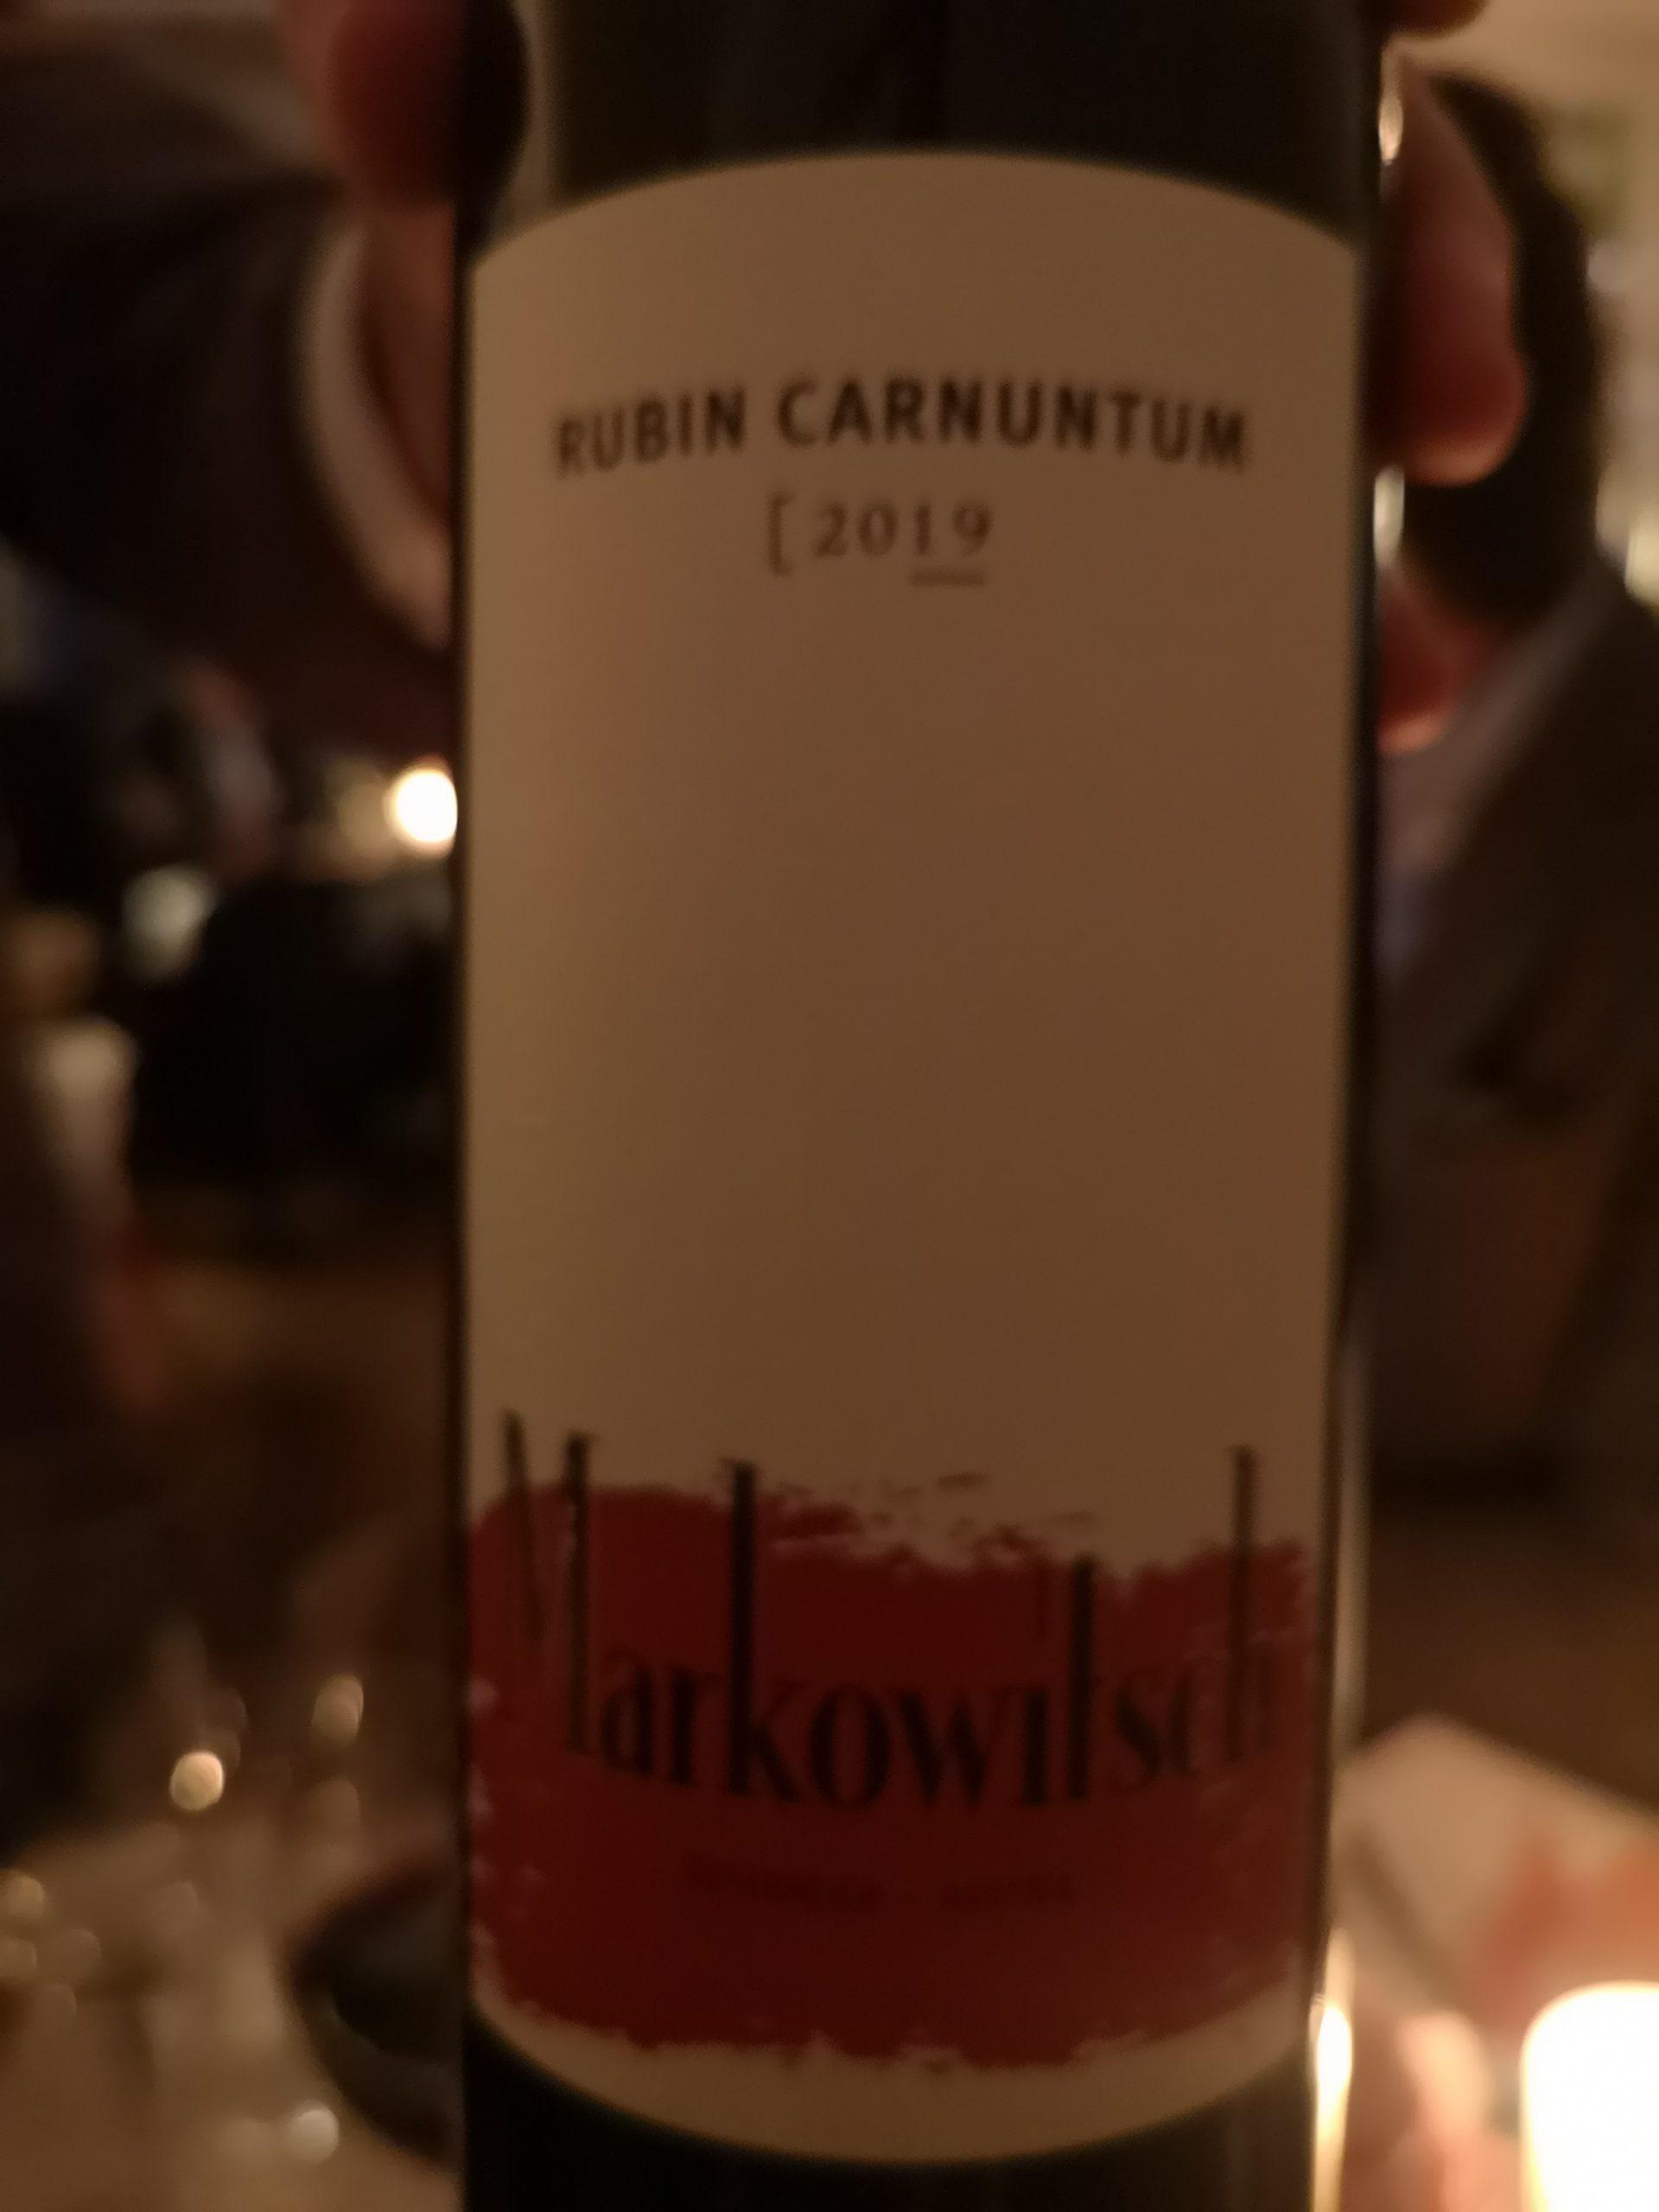 2019 Rubin Carnuntum | Markowitsch